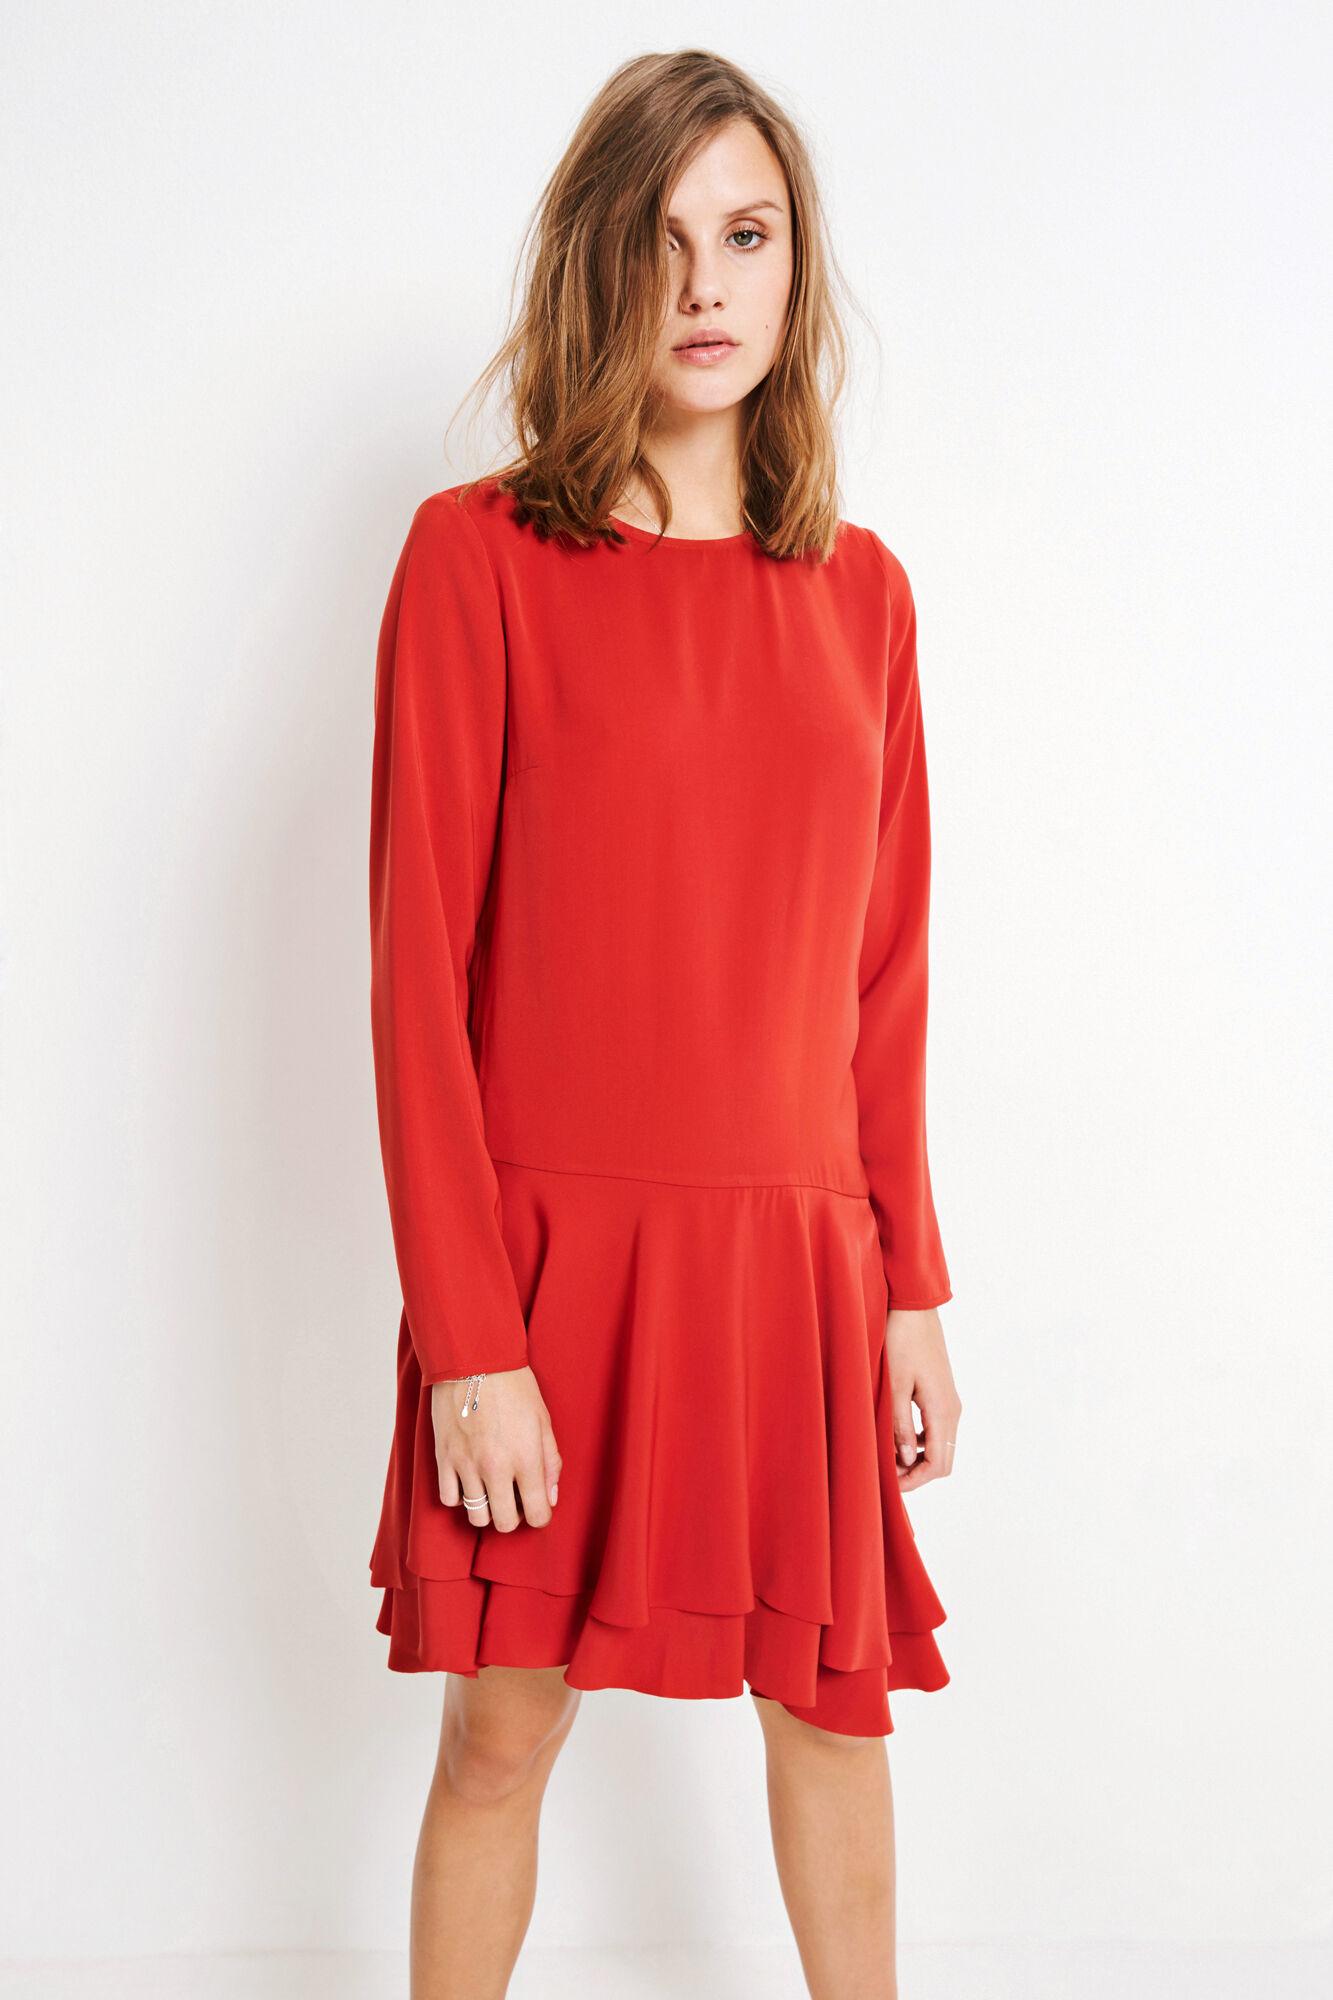 ENAPOLLO LS DRESS 6490